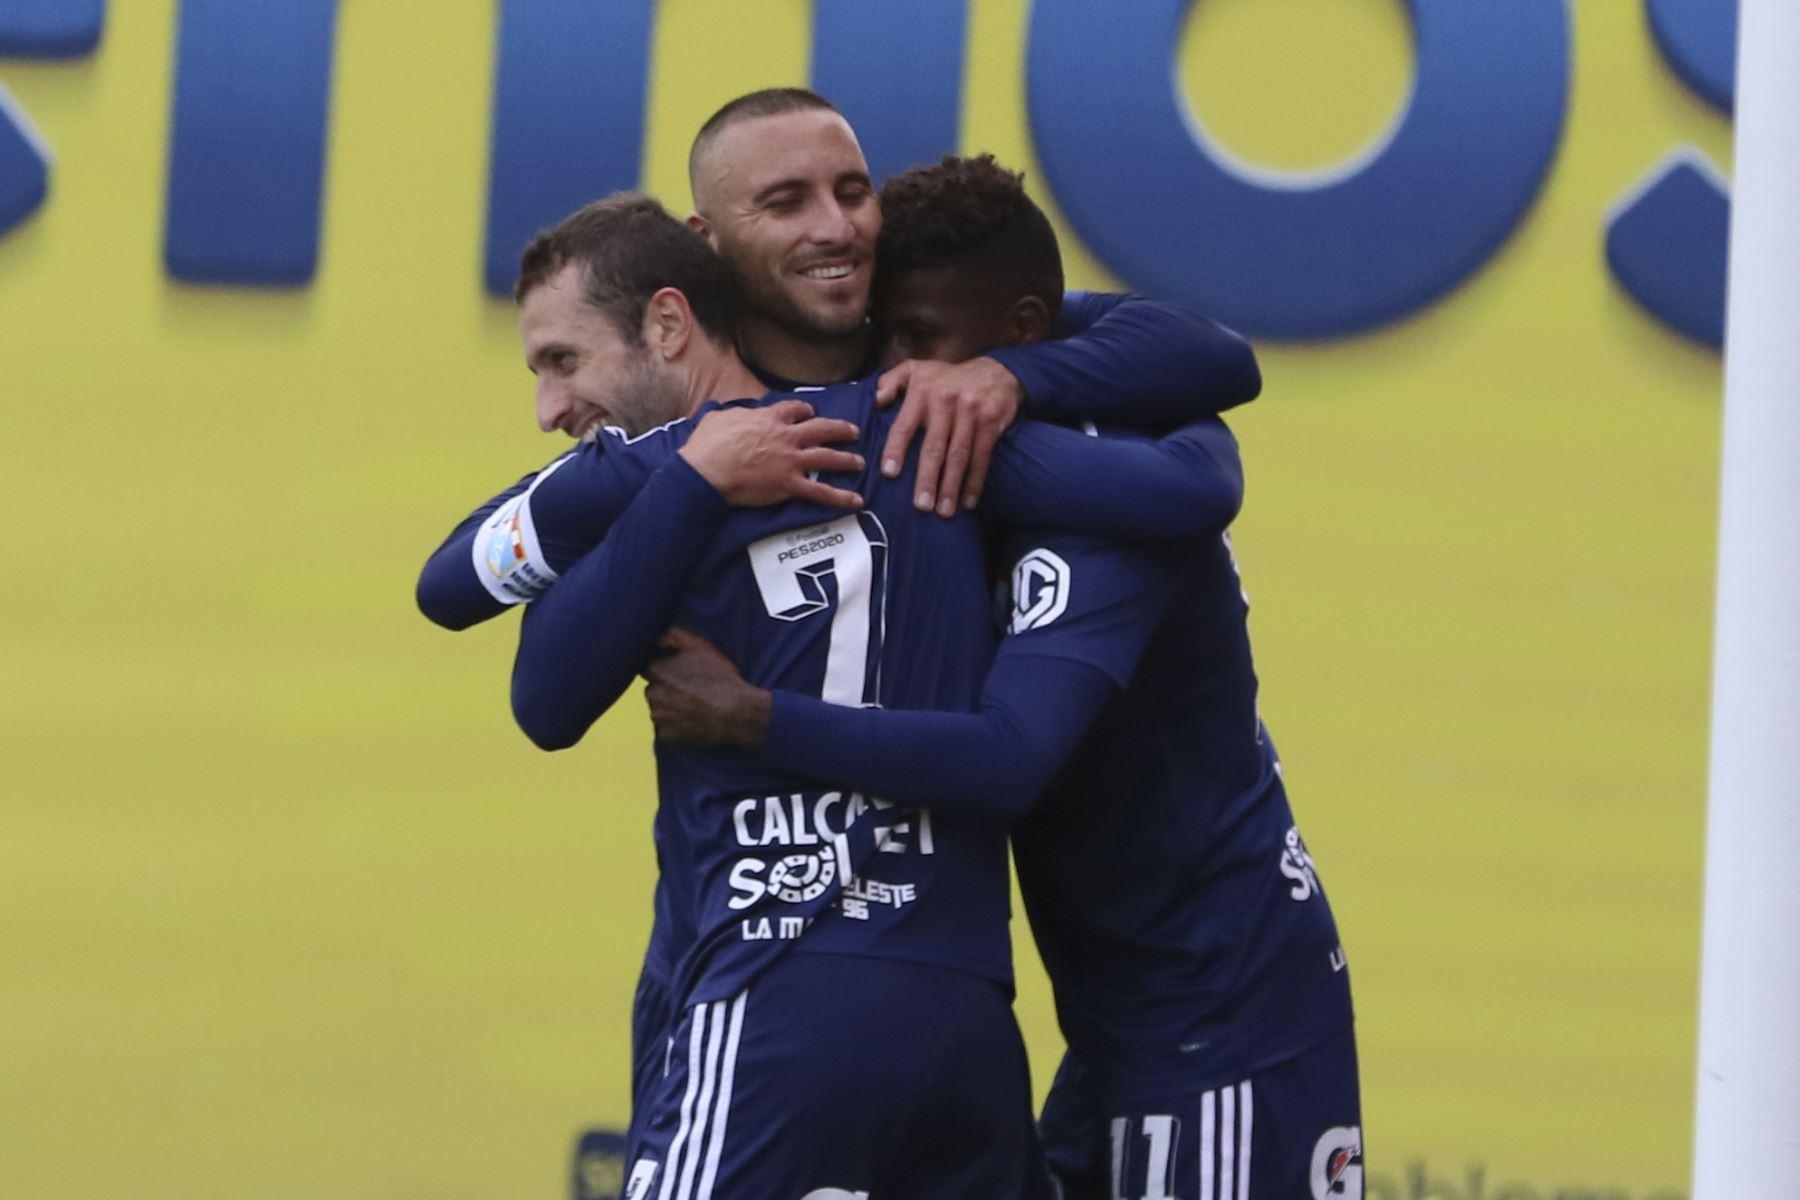 Sporting Cristal goleó 4-1 a Dep. LLacuabamba con doblete del argentino Manuel Herrera. Foto: Liga 1